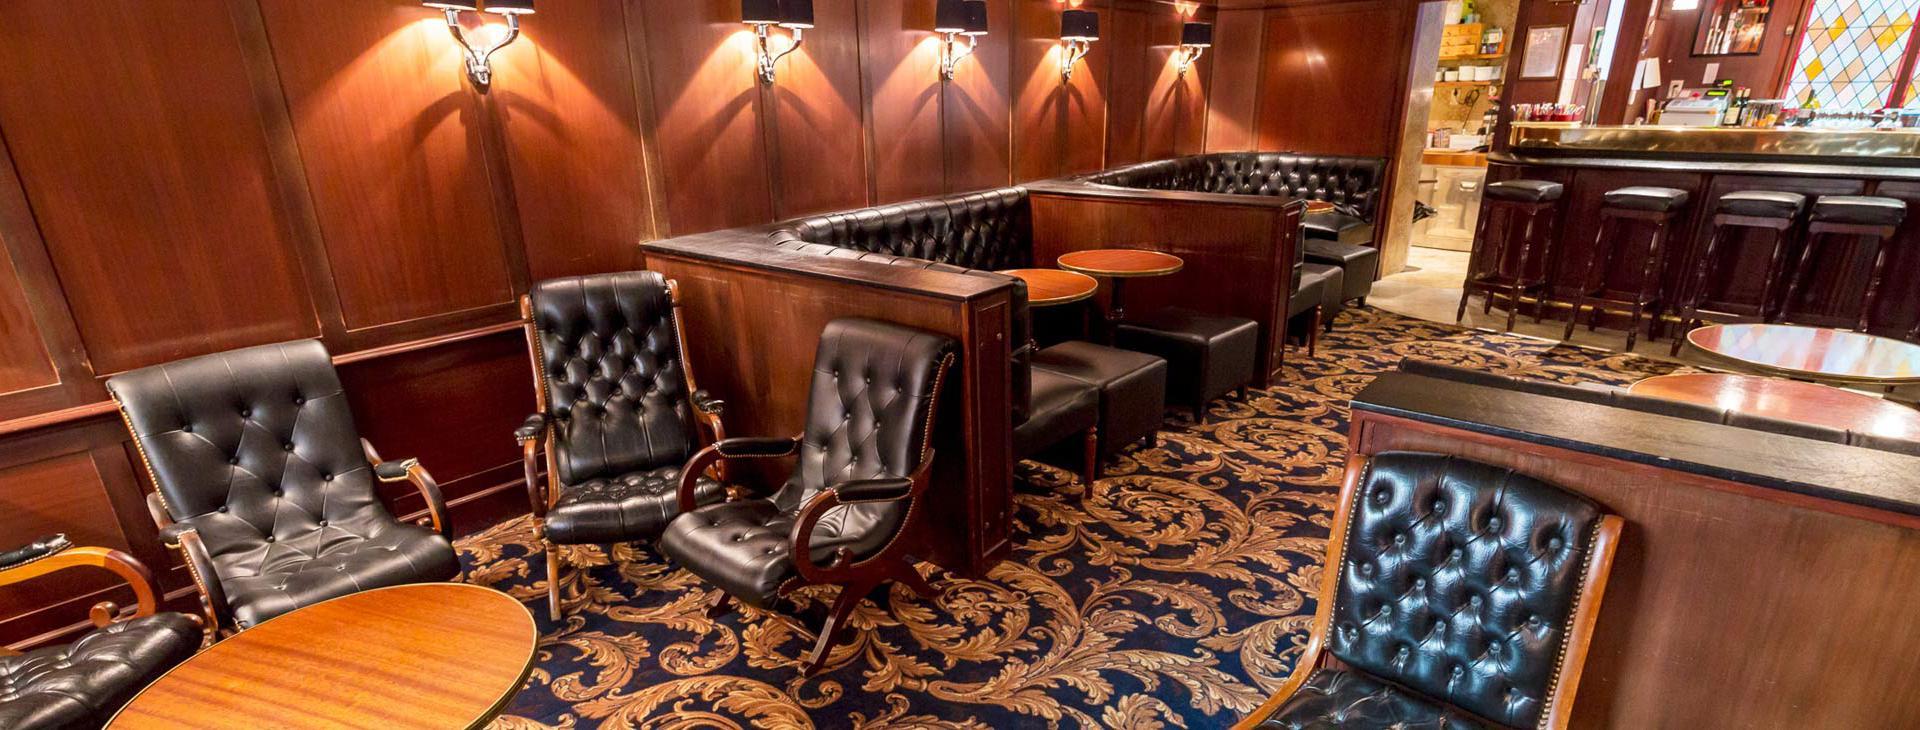 Hotel d'Irlande 3 étoiles Lourdes salon moderne